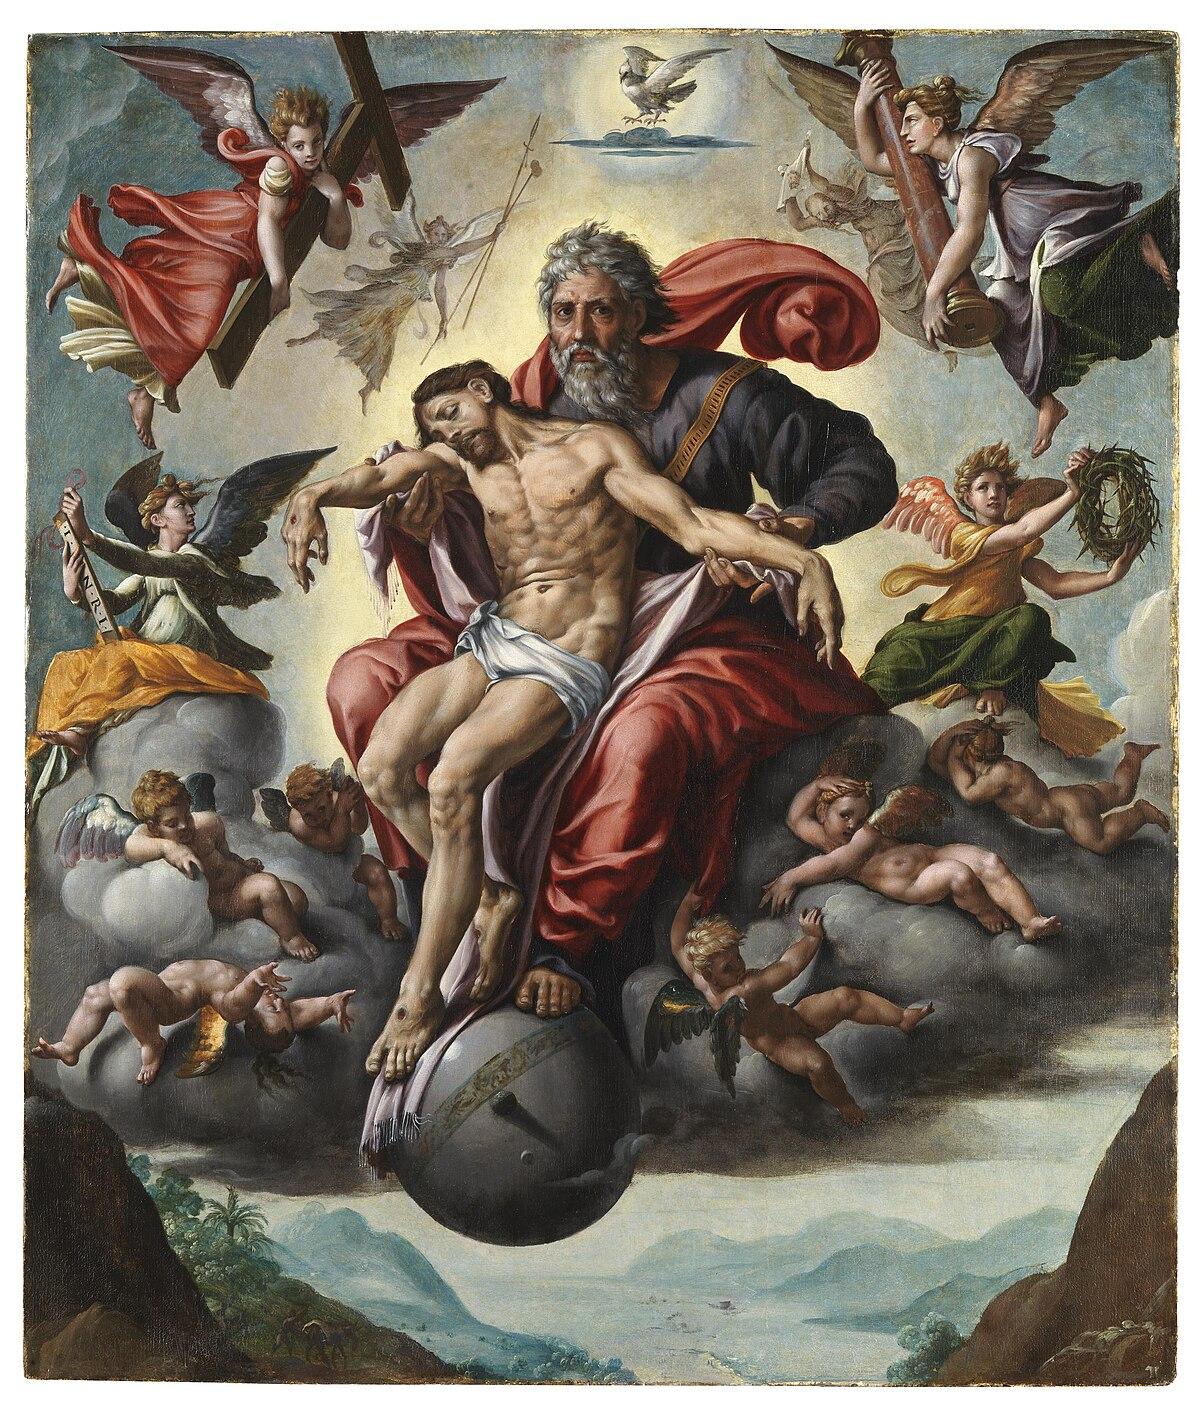 Christian Wallpaper Fall Economy Of Salvation Wikipedia